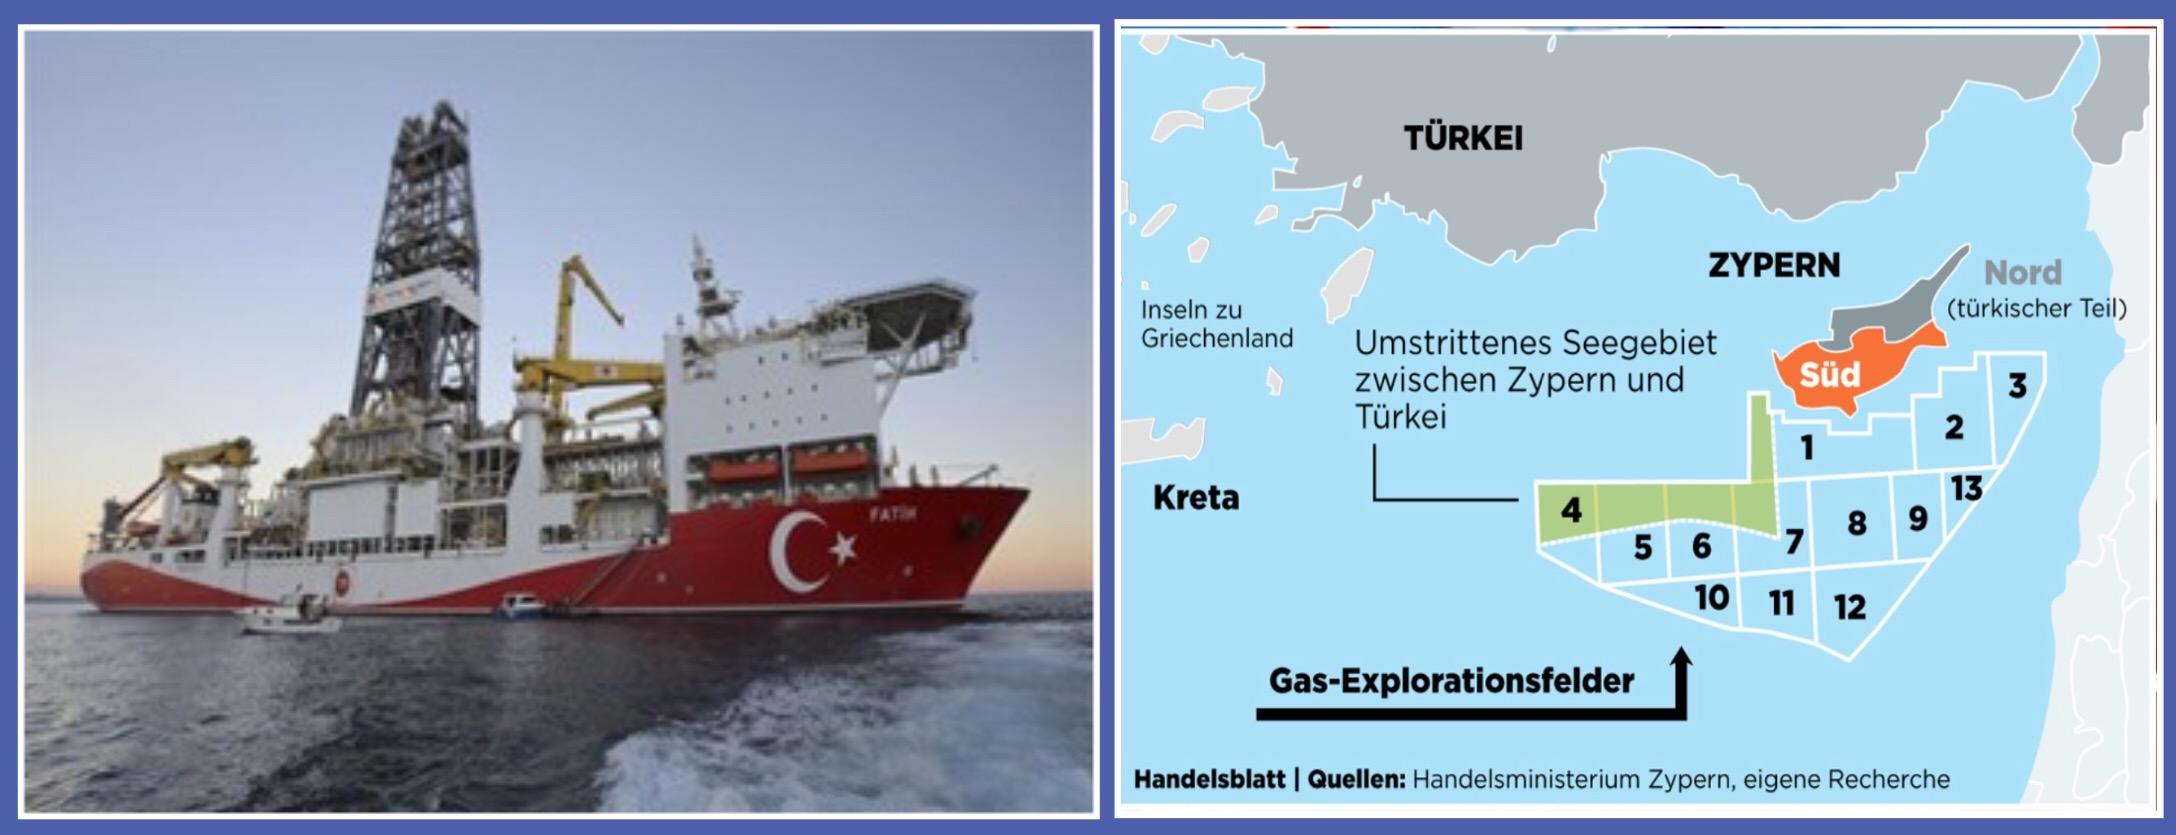 Photo of الاتحاد الأوربي يحضر لفرض عقوبات على تركيا يوم الاثنين